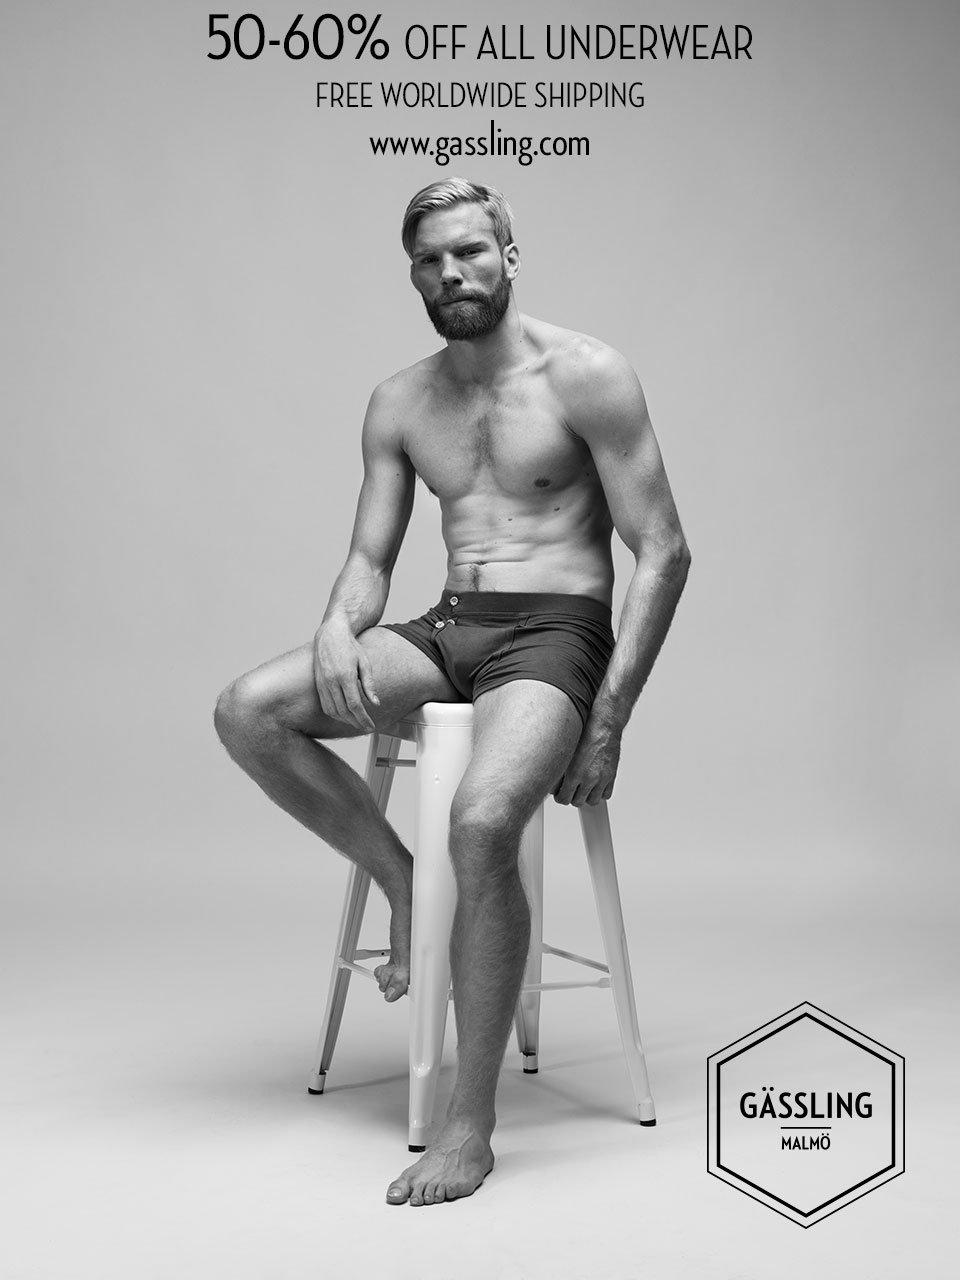 Gässling mens underwear >50% OFF